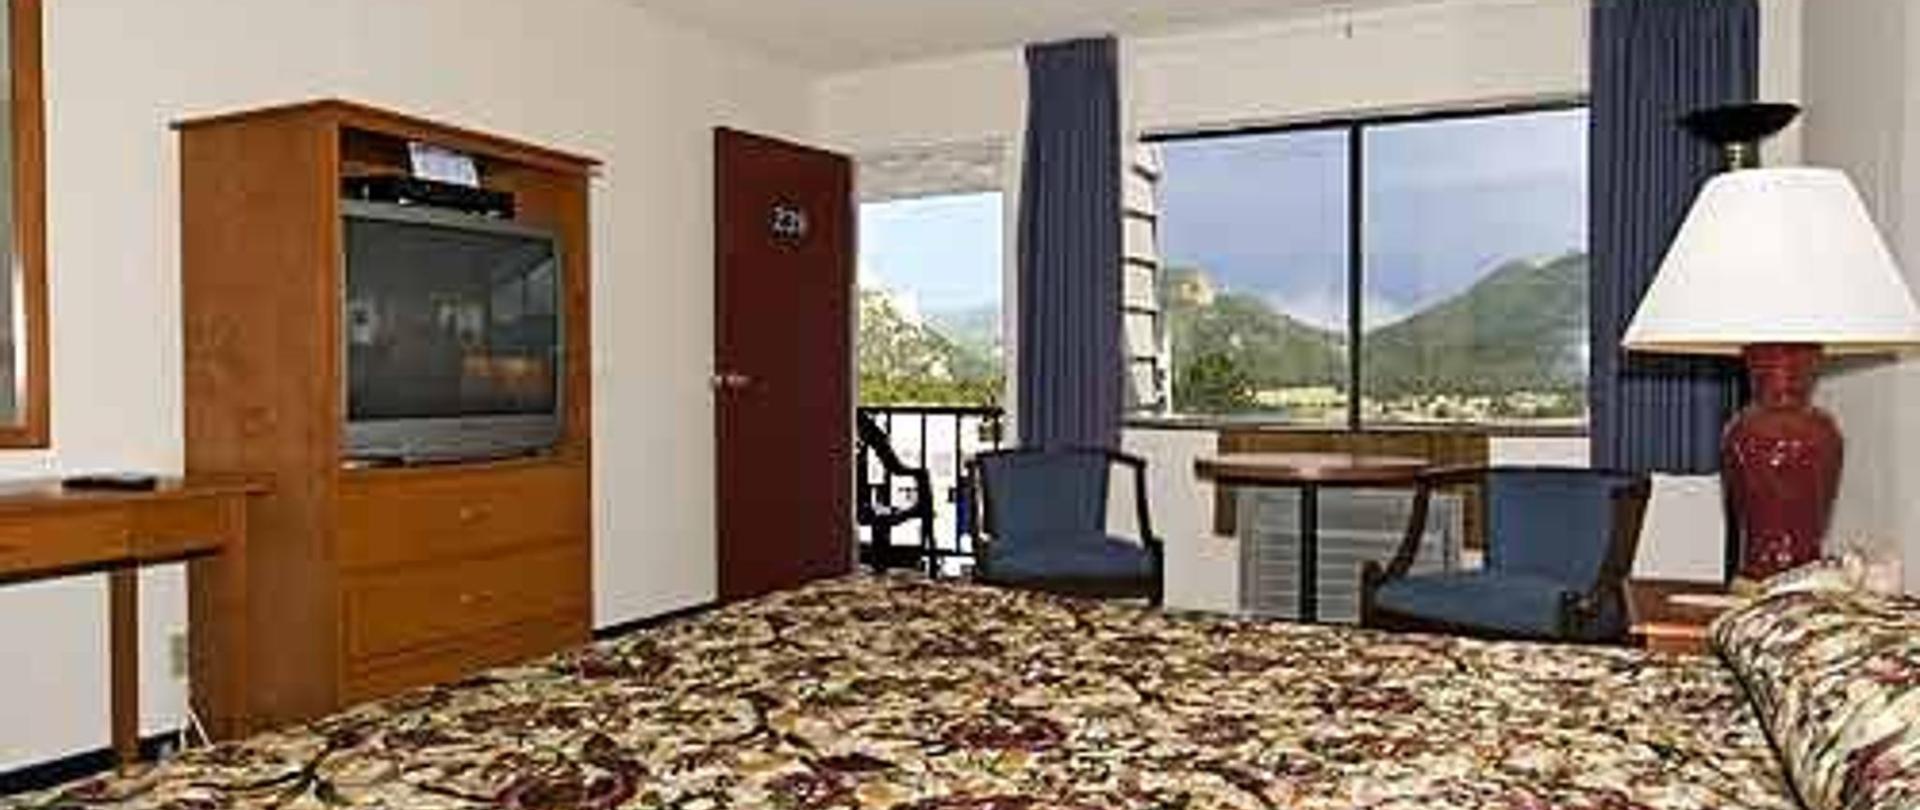 ri-kingroom-dsc06285-500-11.jpg